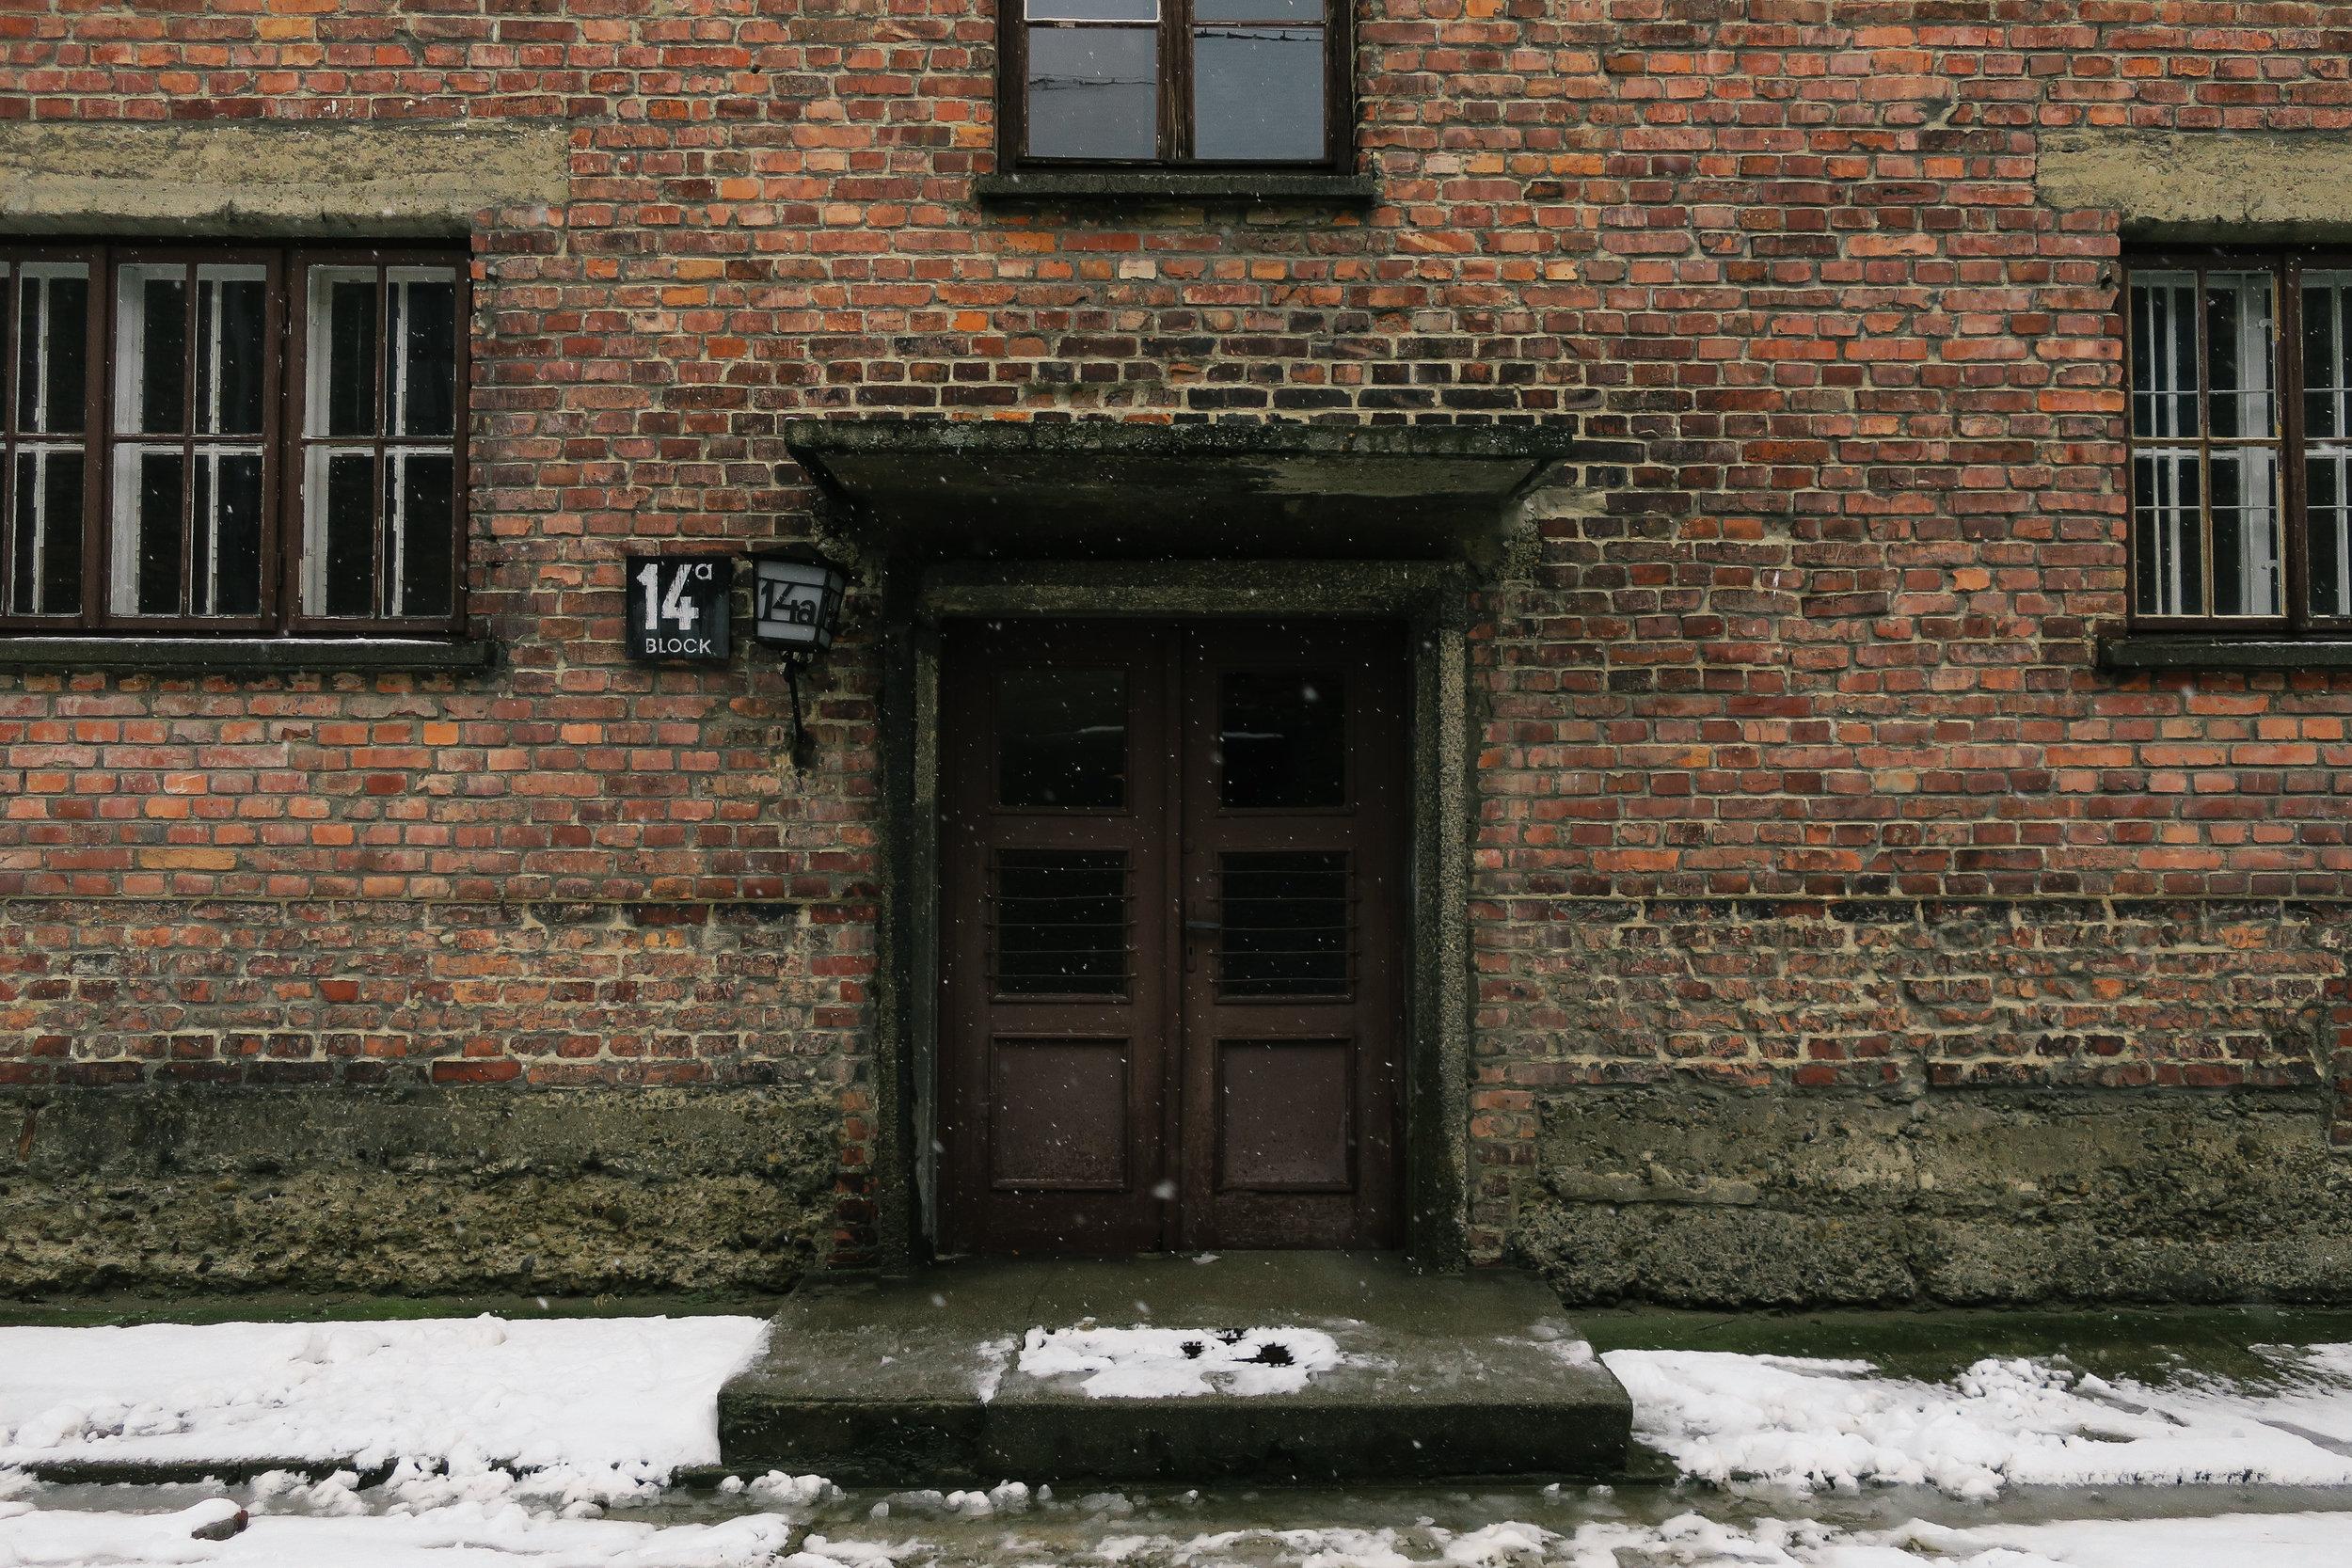 aushwitz-krakow-poland-travel-guide-lifeonpin_IMG_0181.jpg